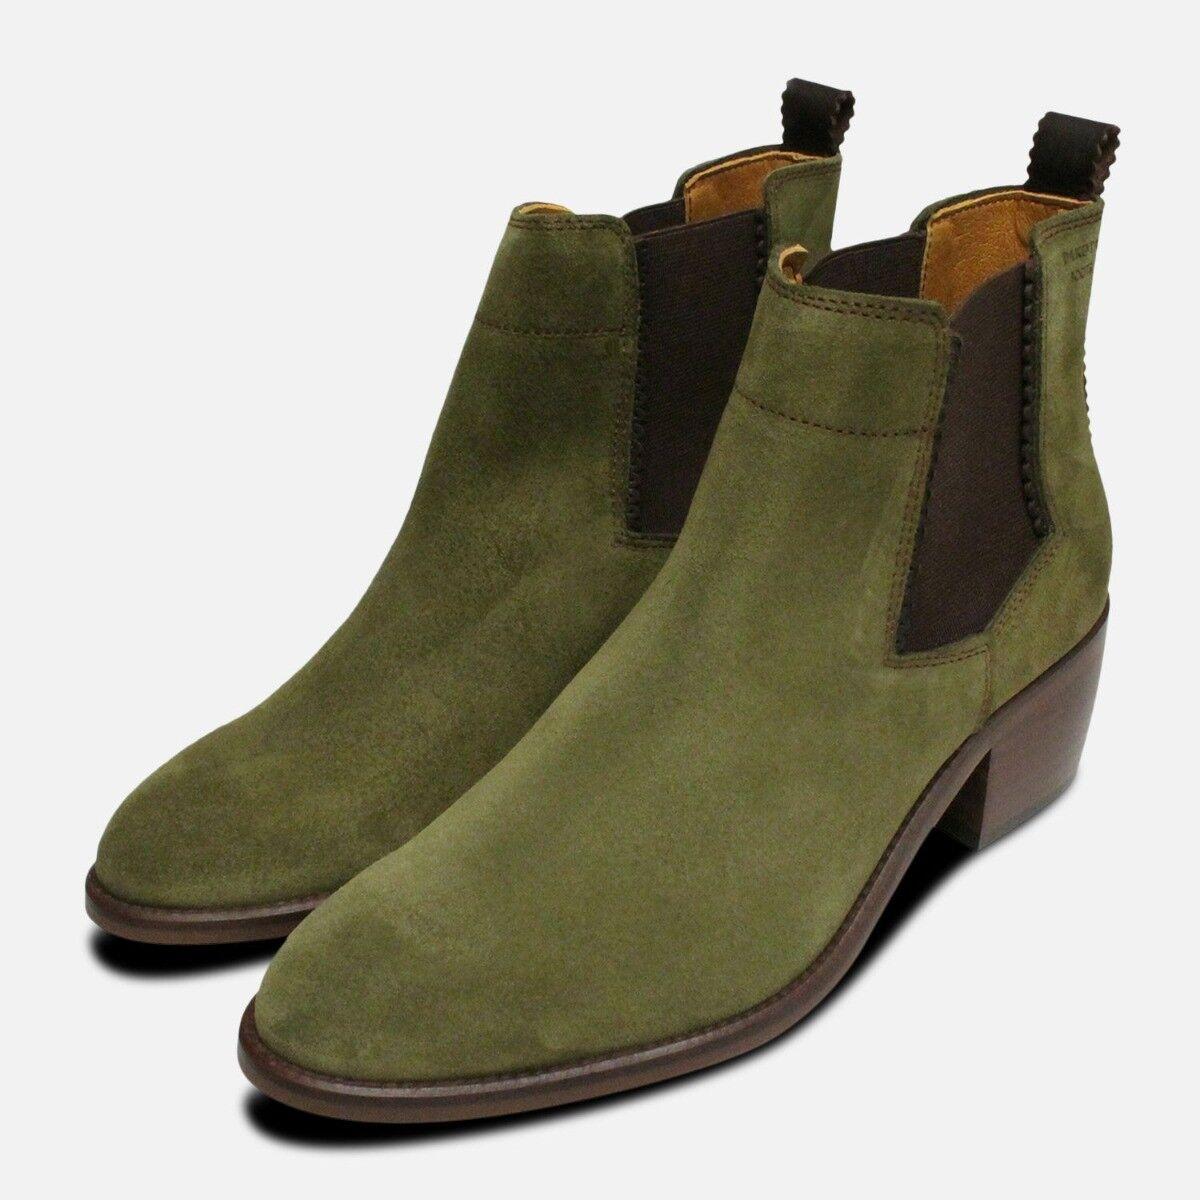 Blockabsatz Chelsea Stiefel in Moosgrün Wildleder